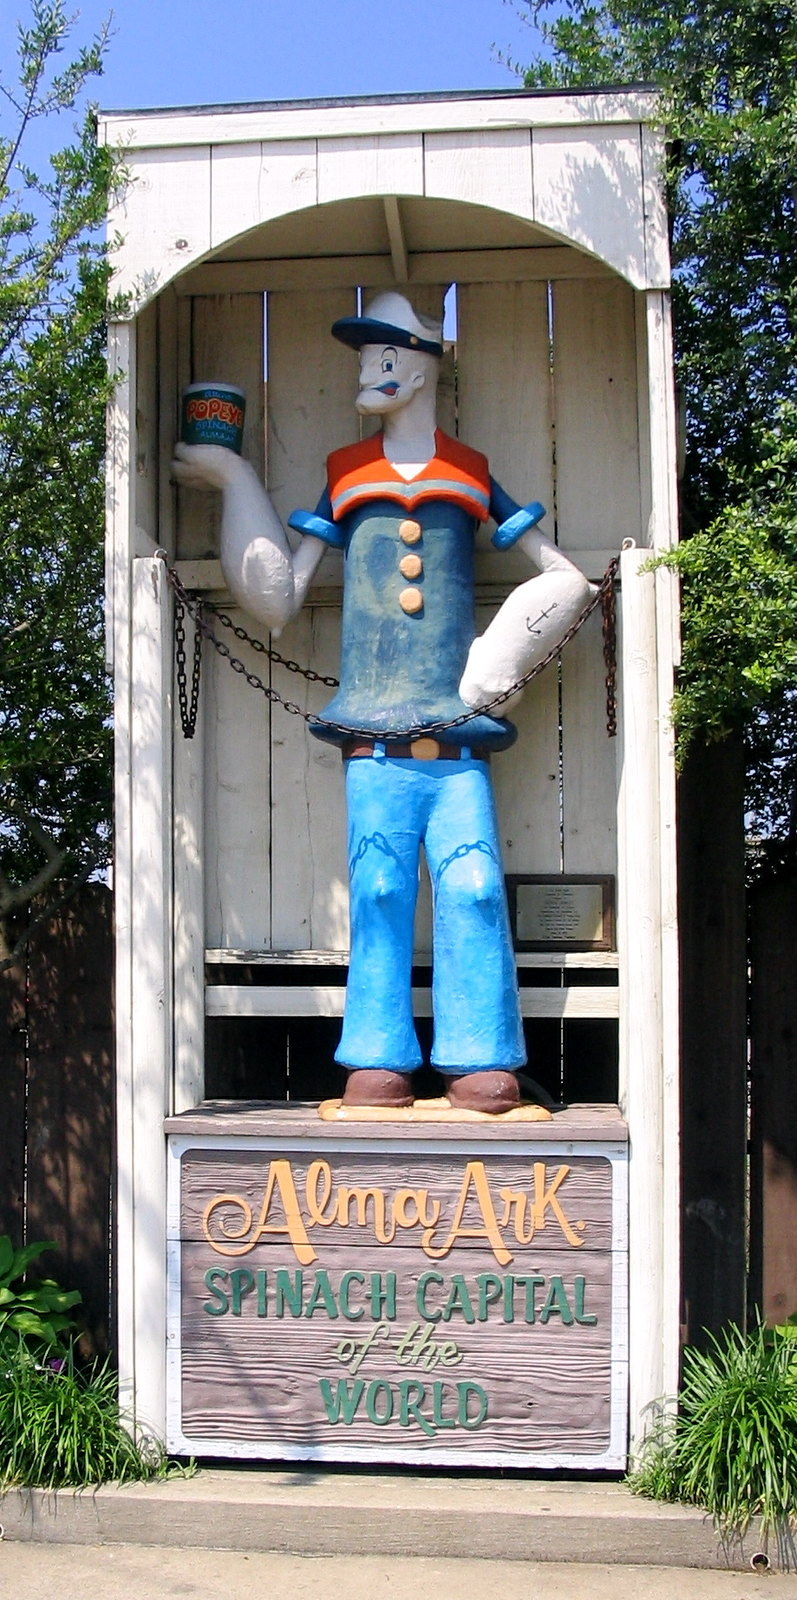 Popeye Statue in Alma, Arkansas